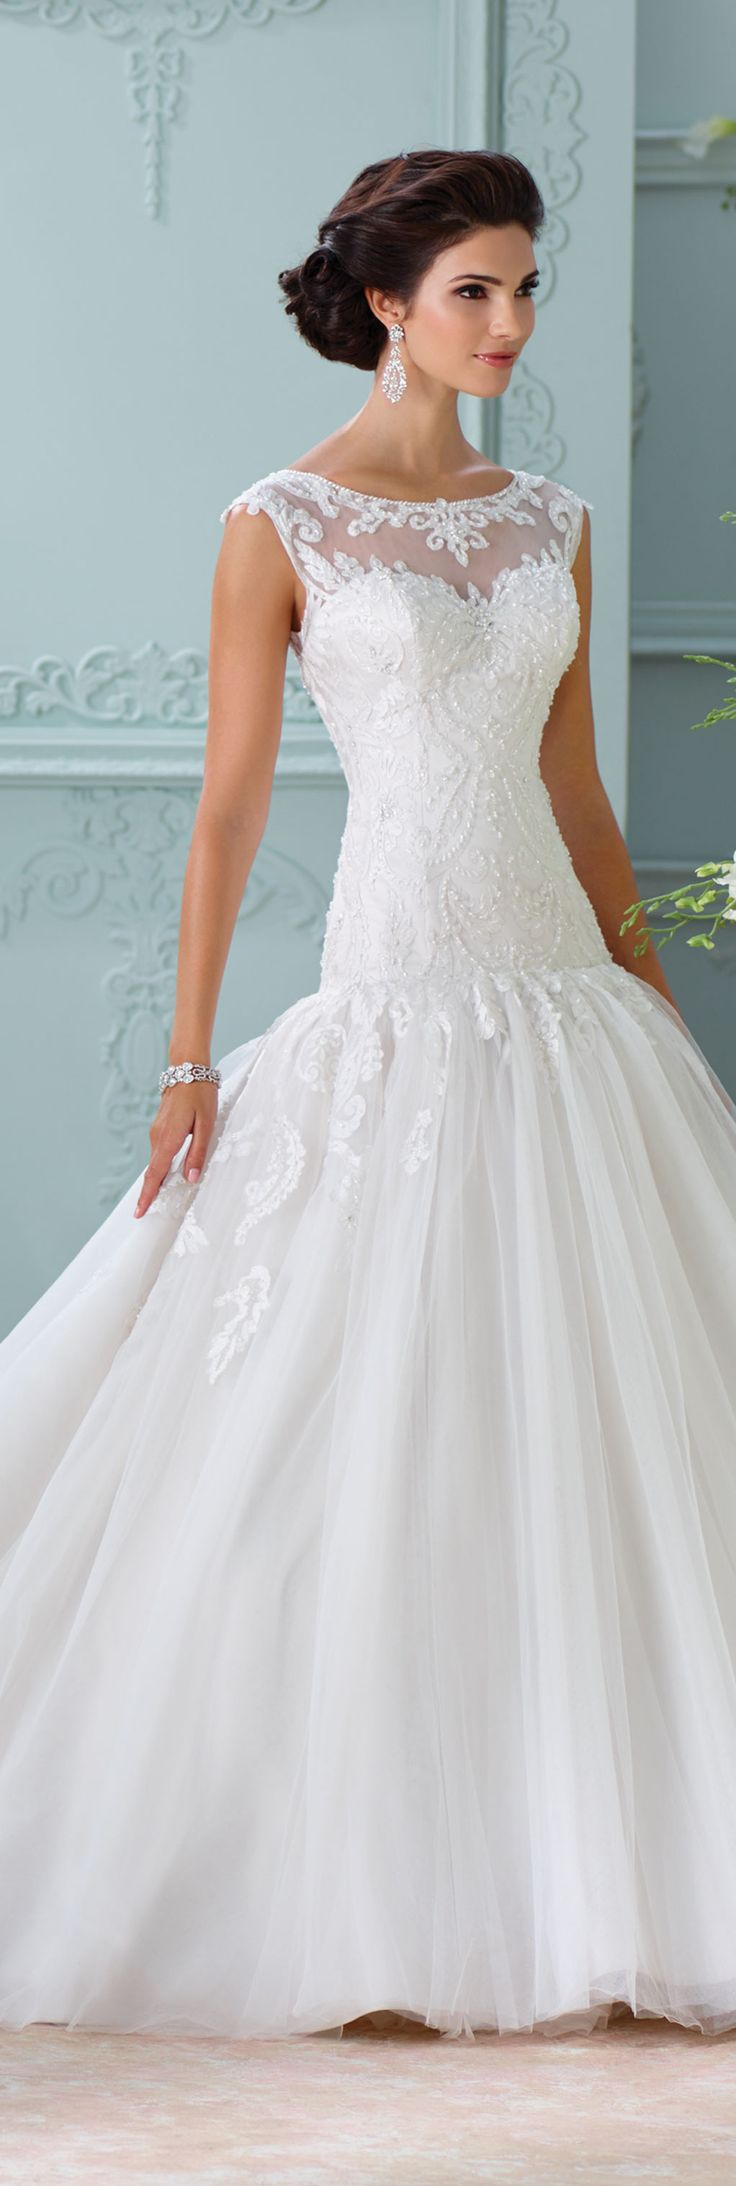 18 best Christian Wedding Gowns images on Pinterest | Short wedding ...